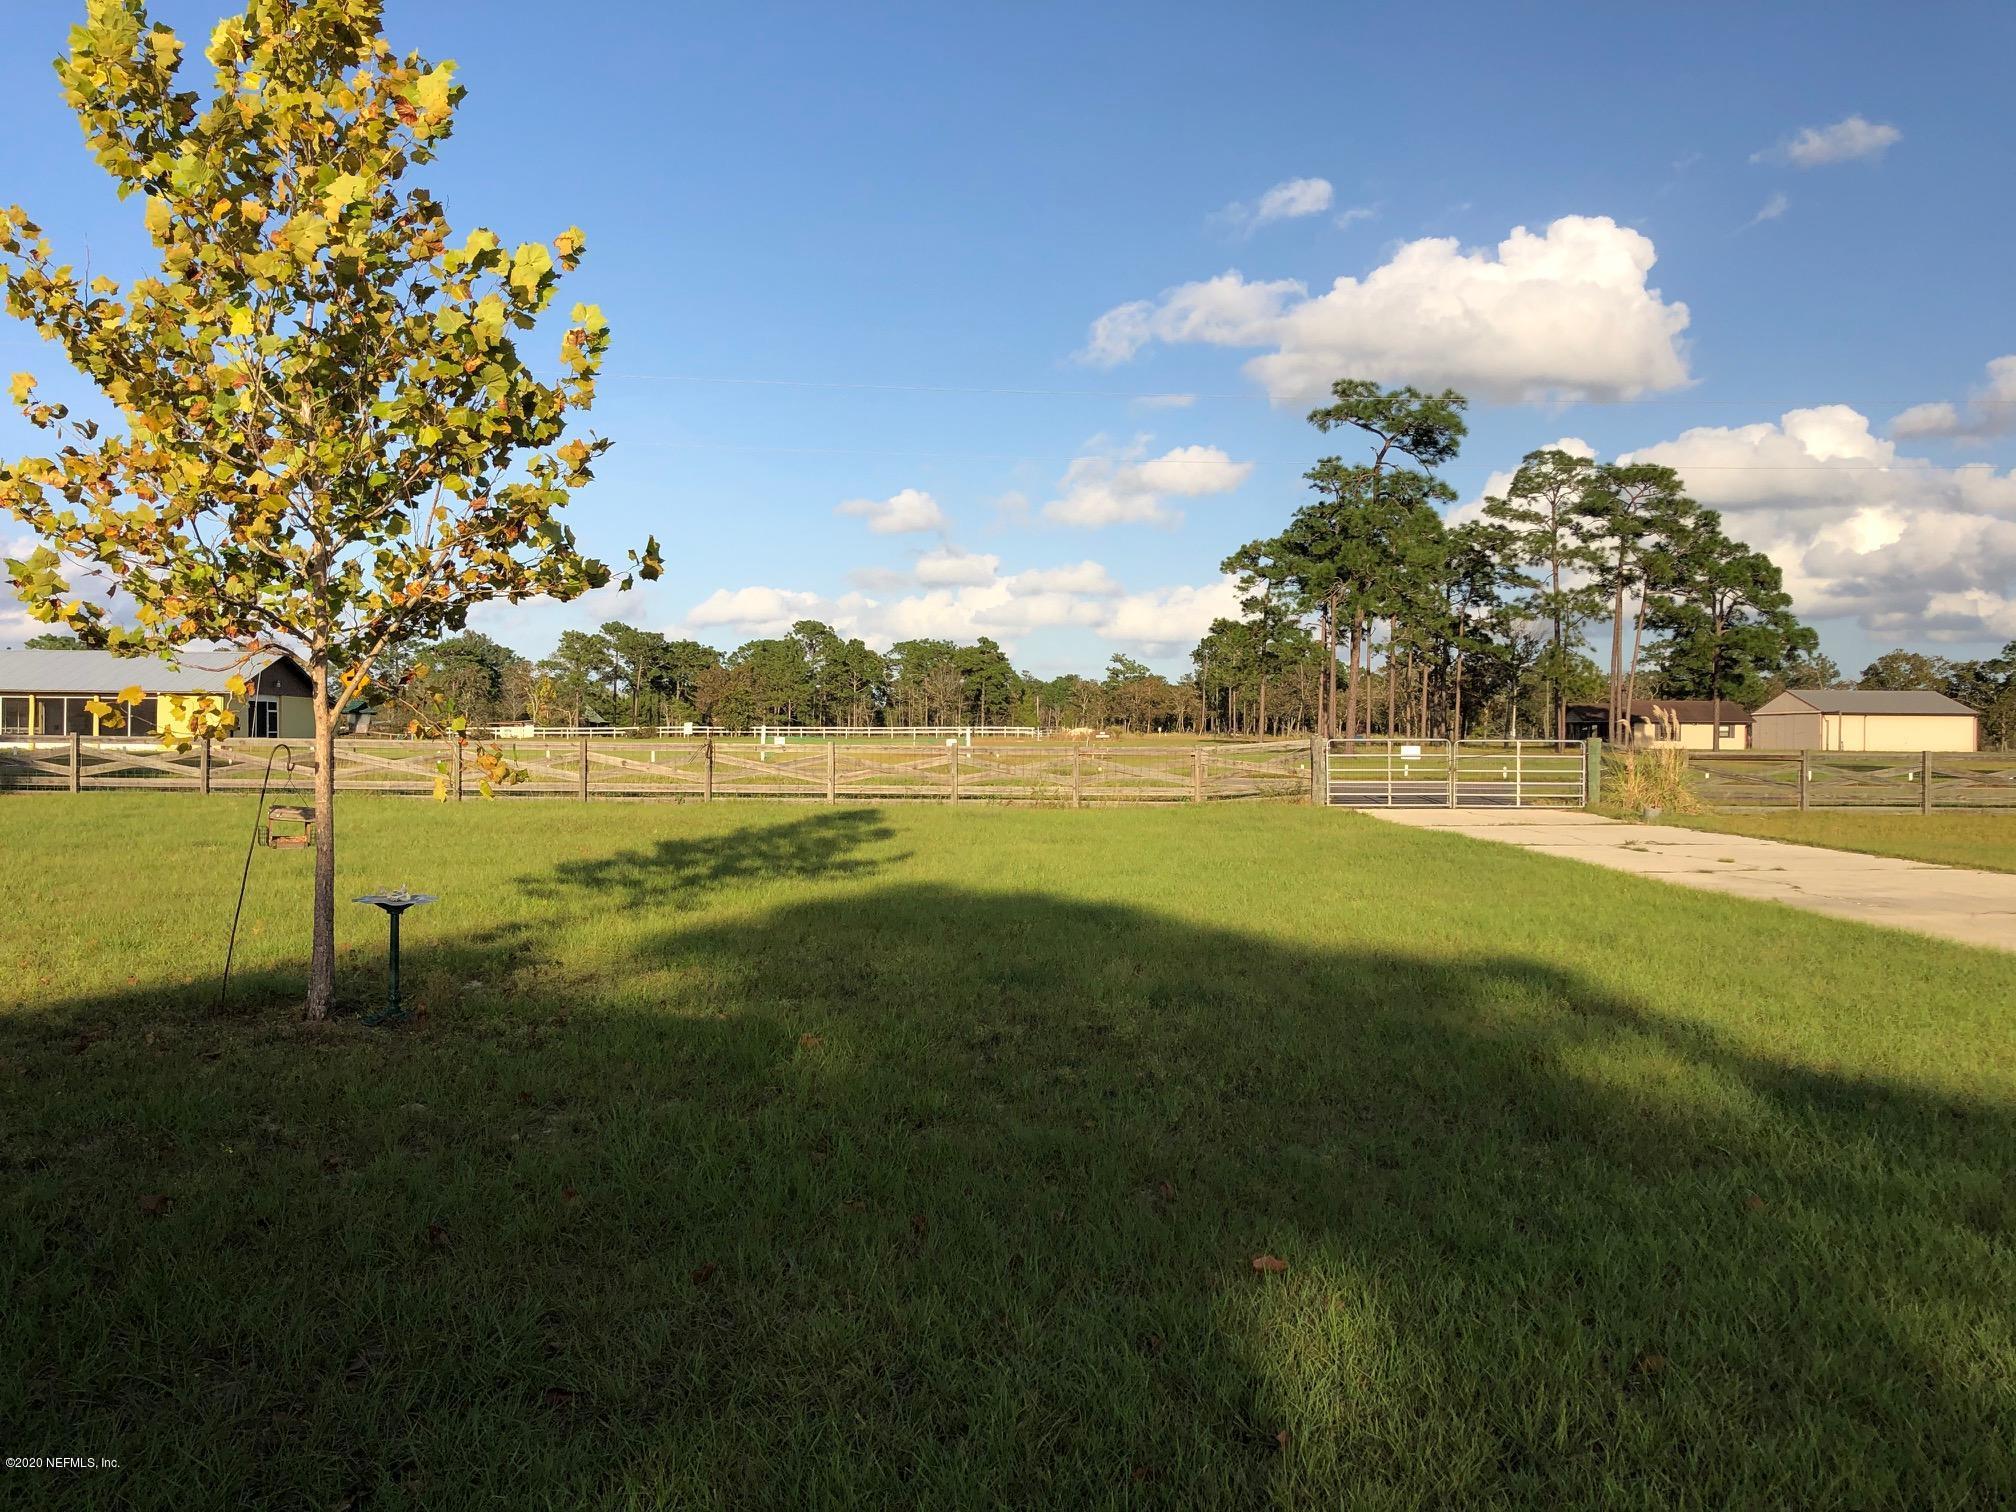 117 MELROSE LANDING, HAWTHORNE, FLORIDA 32640, ,1 BathroomBathrooms,Residential,For sale,MELROSE LANDING,1082545